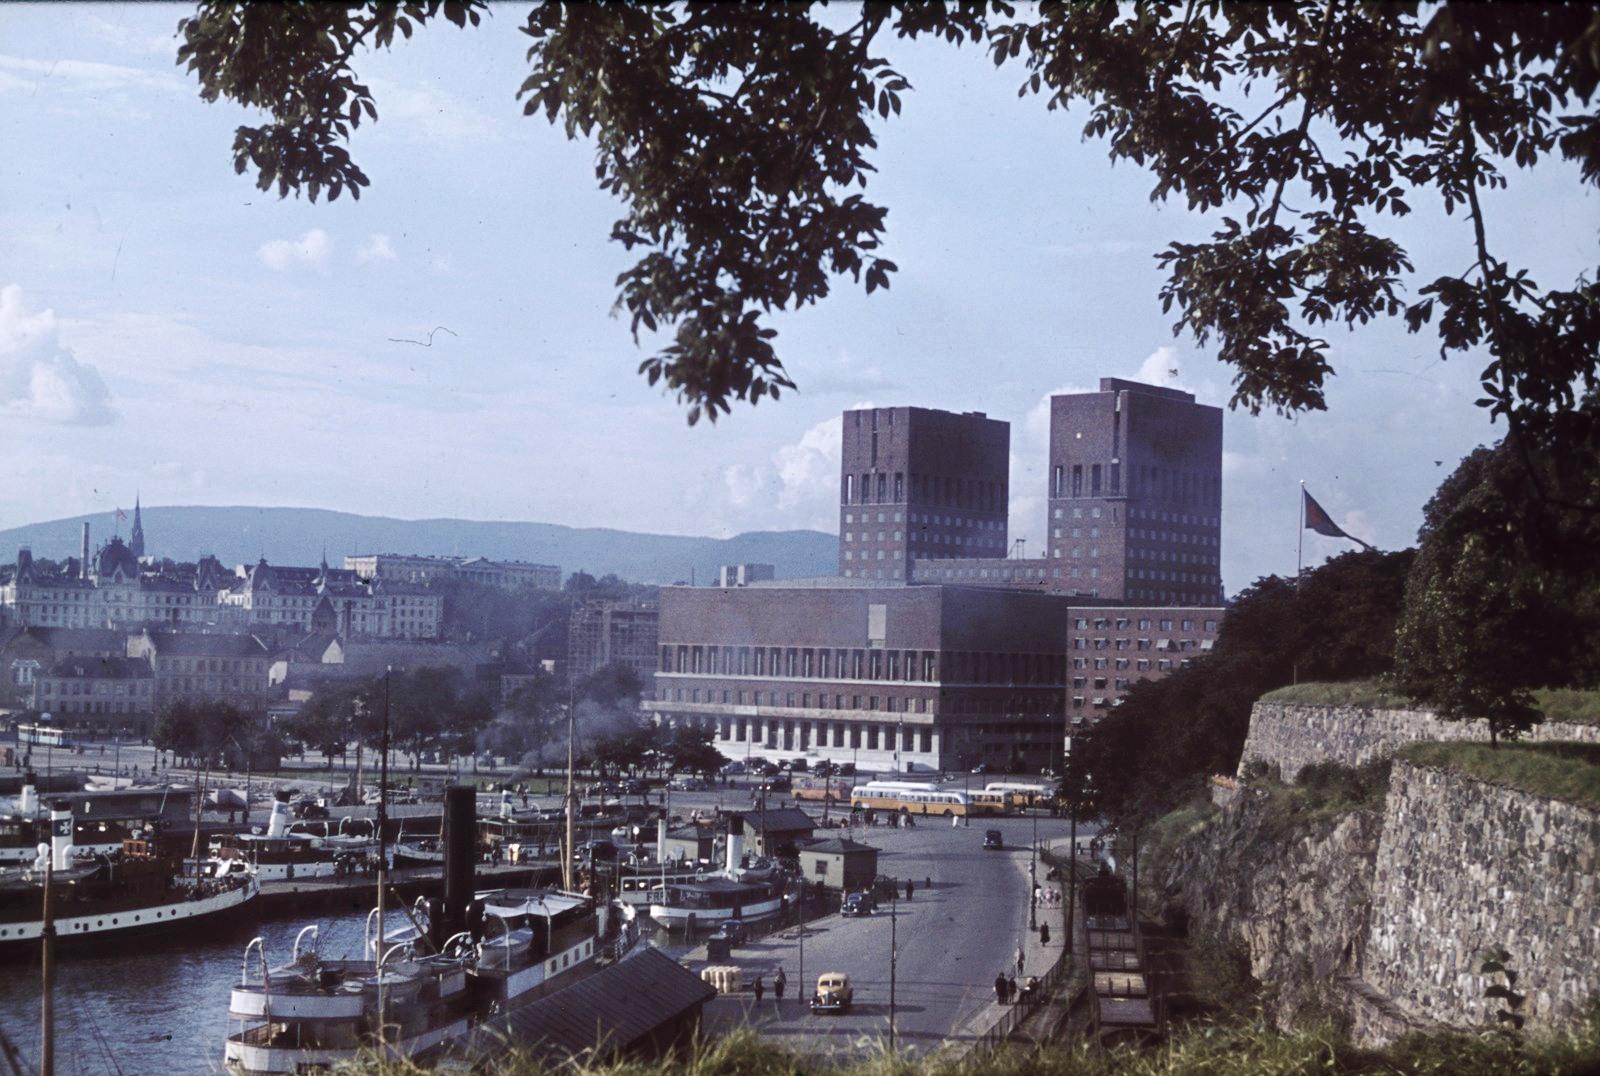 1936-38 Осло. Вид на гавань и город